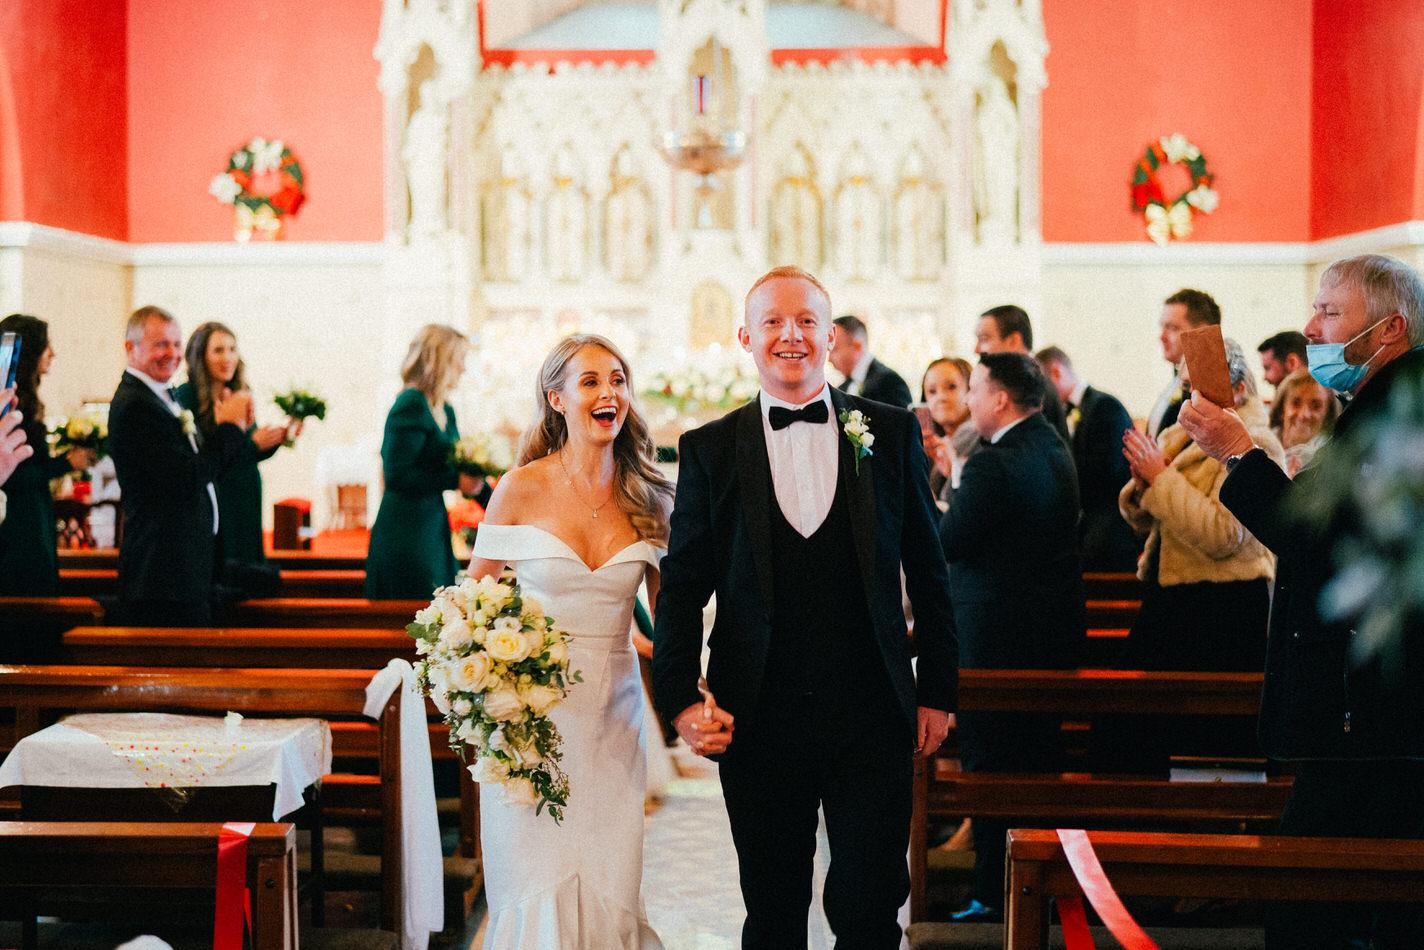 Castle-wedding-ireland-photos- 0145 98